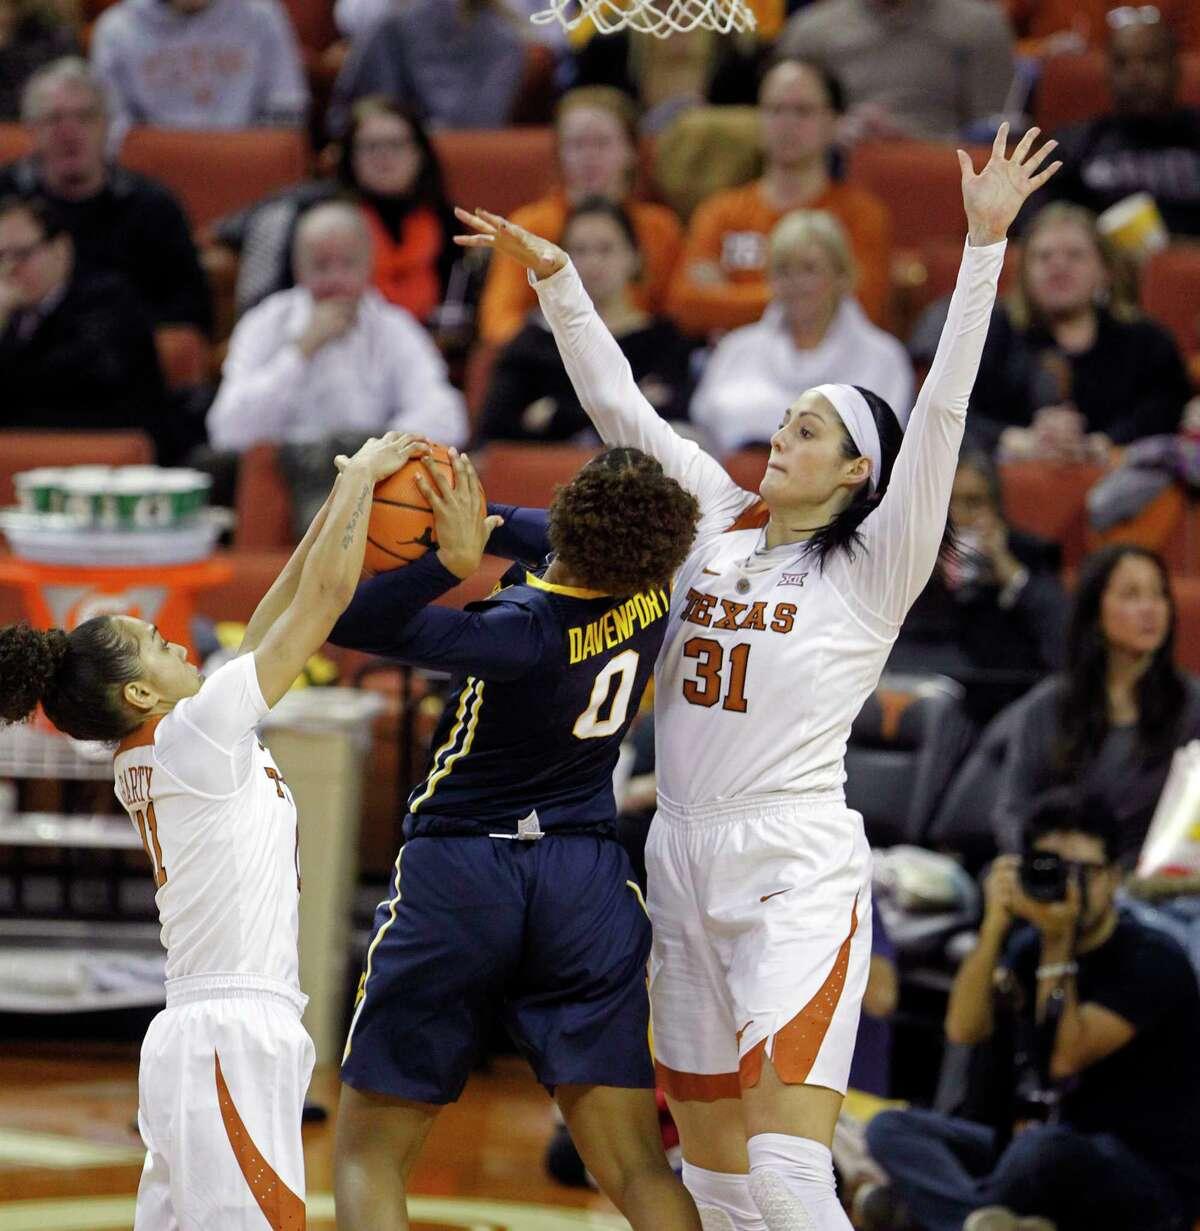 Texas' Brooke McCarty, left, blocks a shot by West Virginia's Naomi Davenport, center, with help from teammate Audrey-Ann Caron-Goudreau on Sunday.